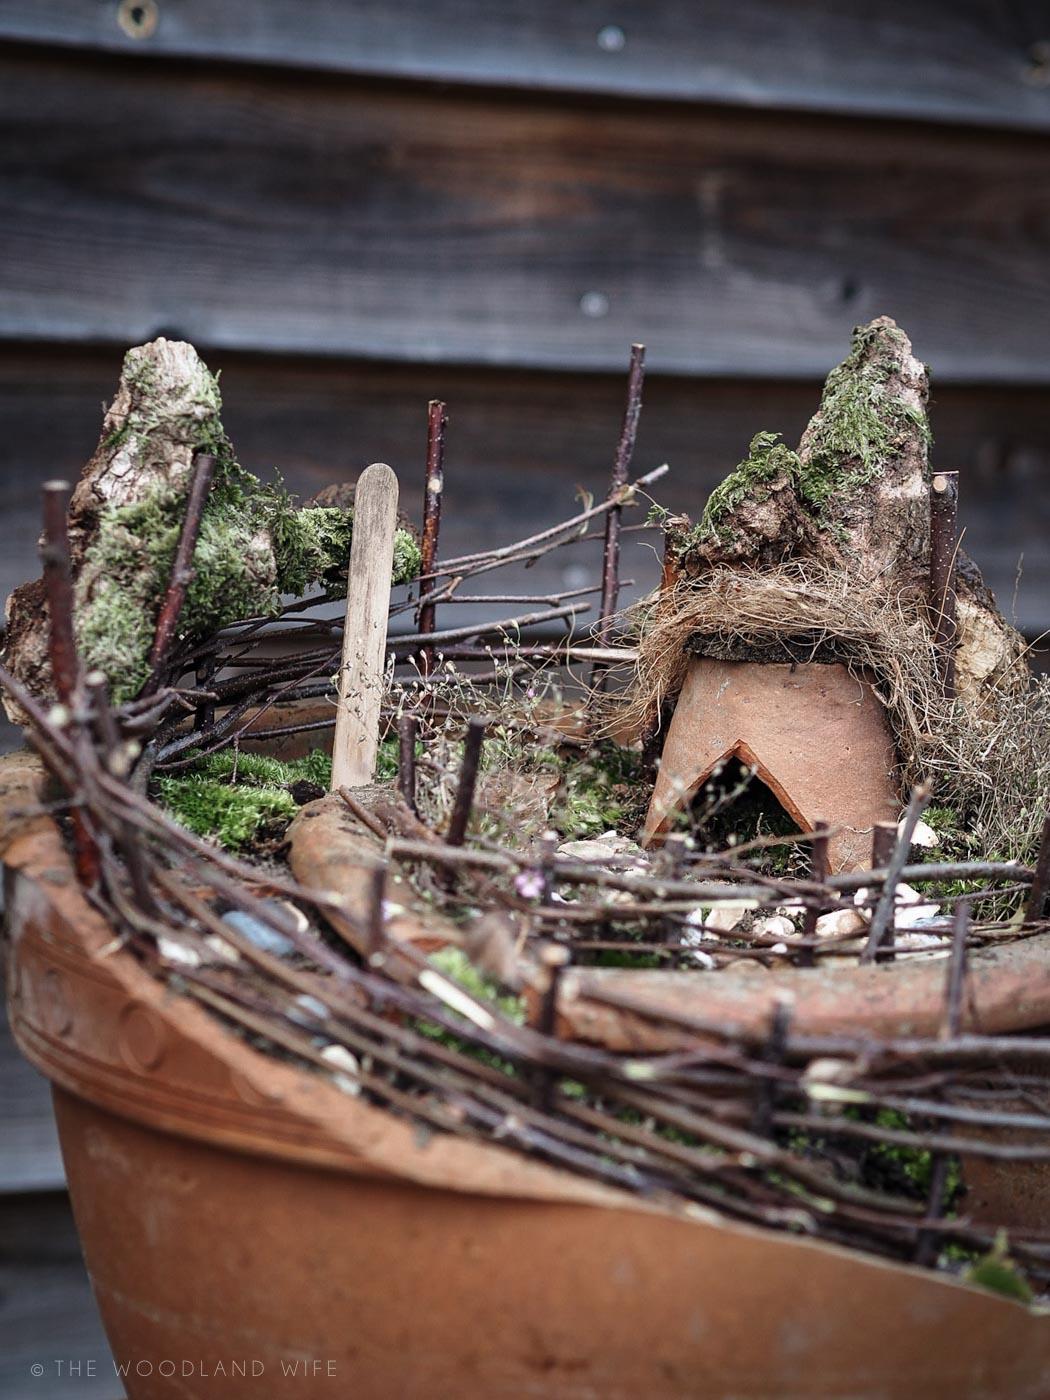 The Woodland Wife - How to Make Broken Pot Fairy Garden